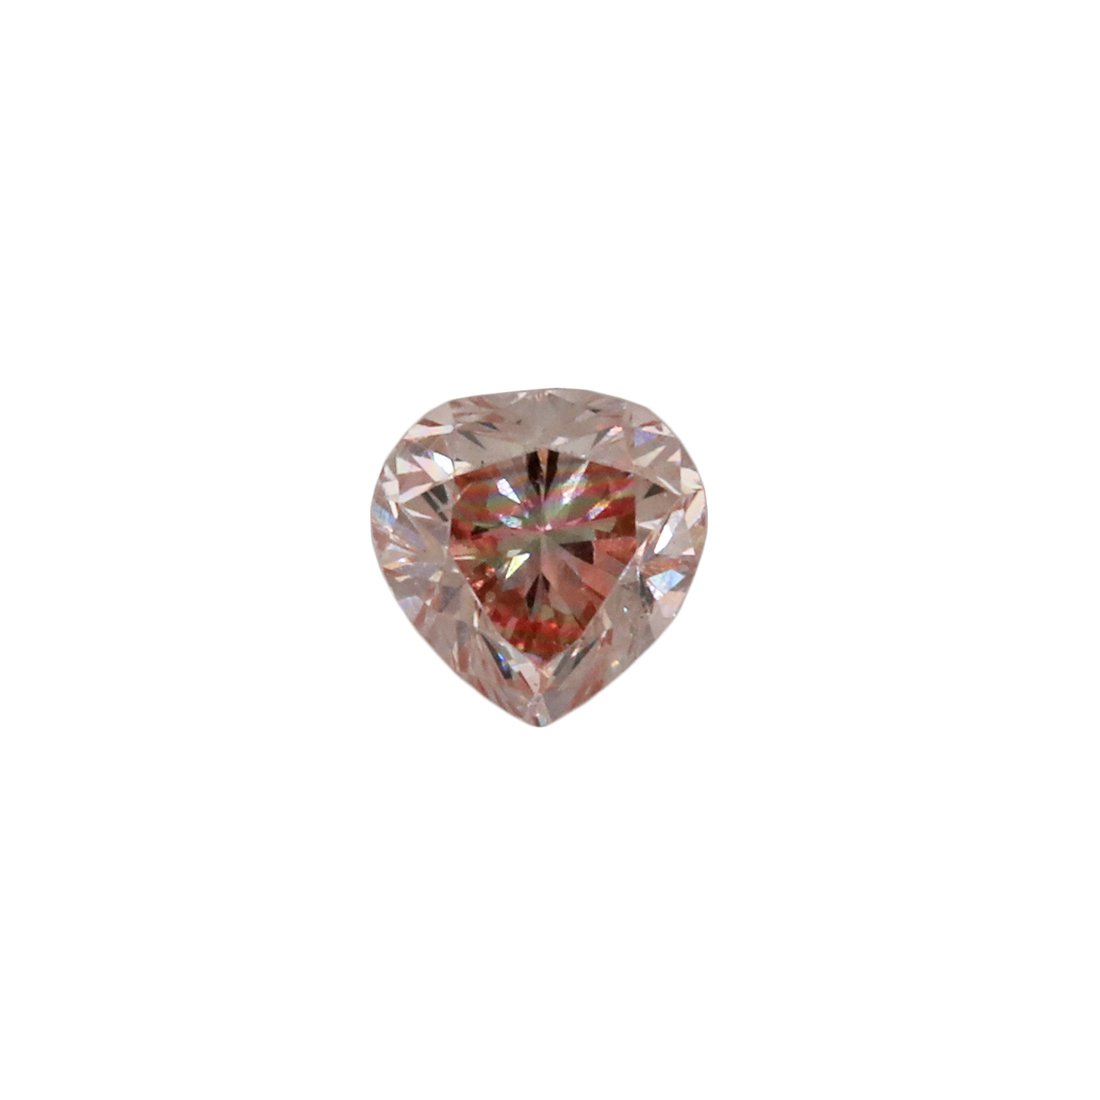 0.15ct Natural Fancy Pink, 6PR, SI1, Argyle Pink Diamond